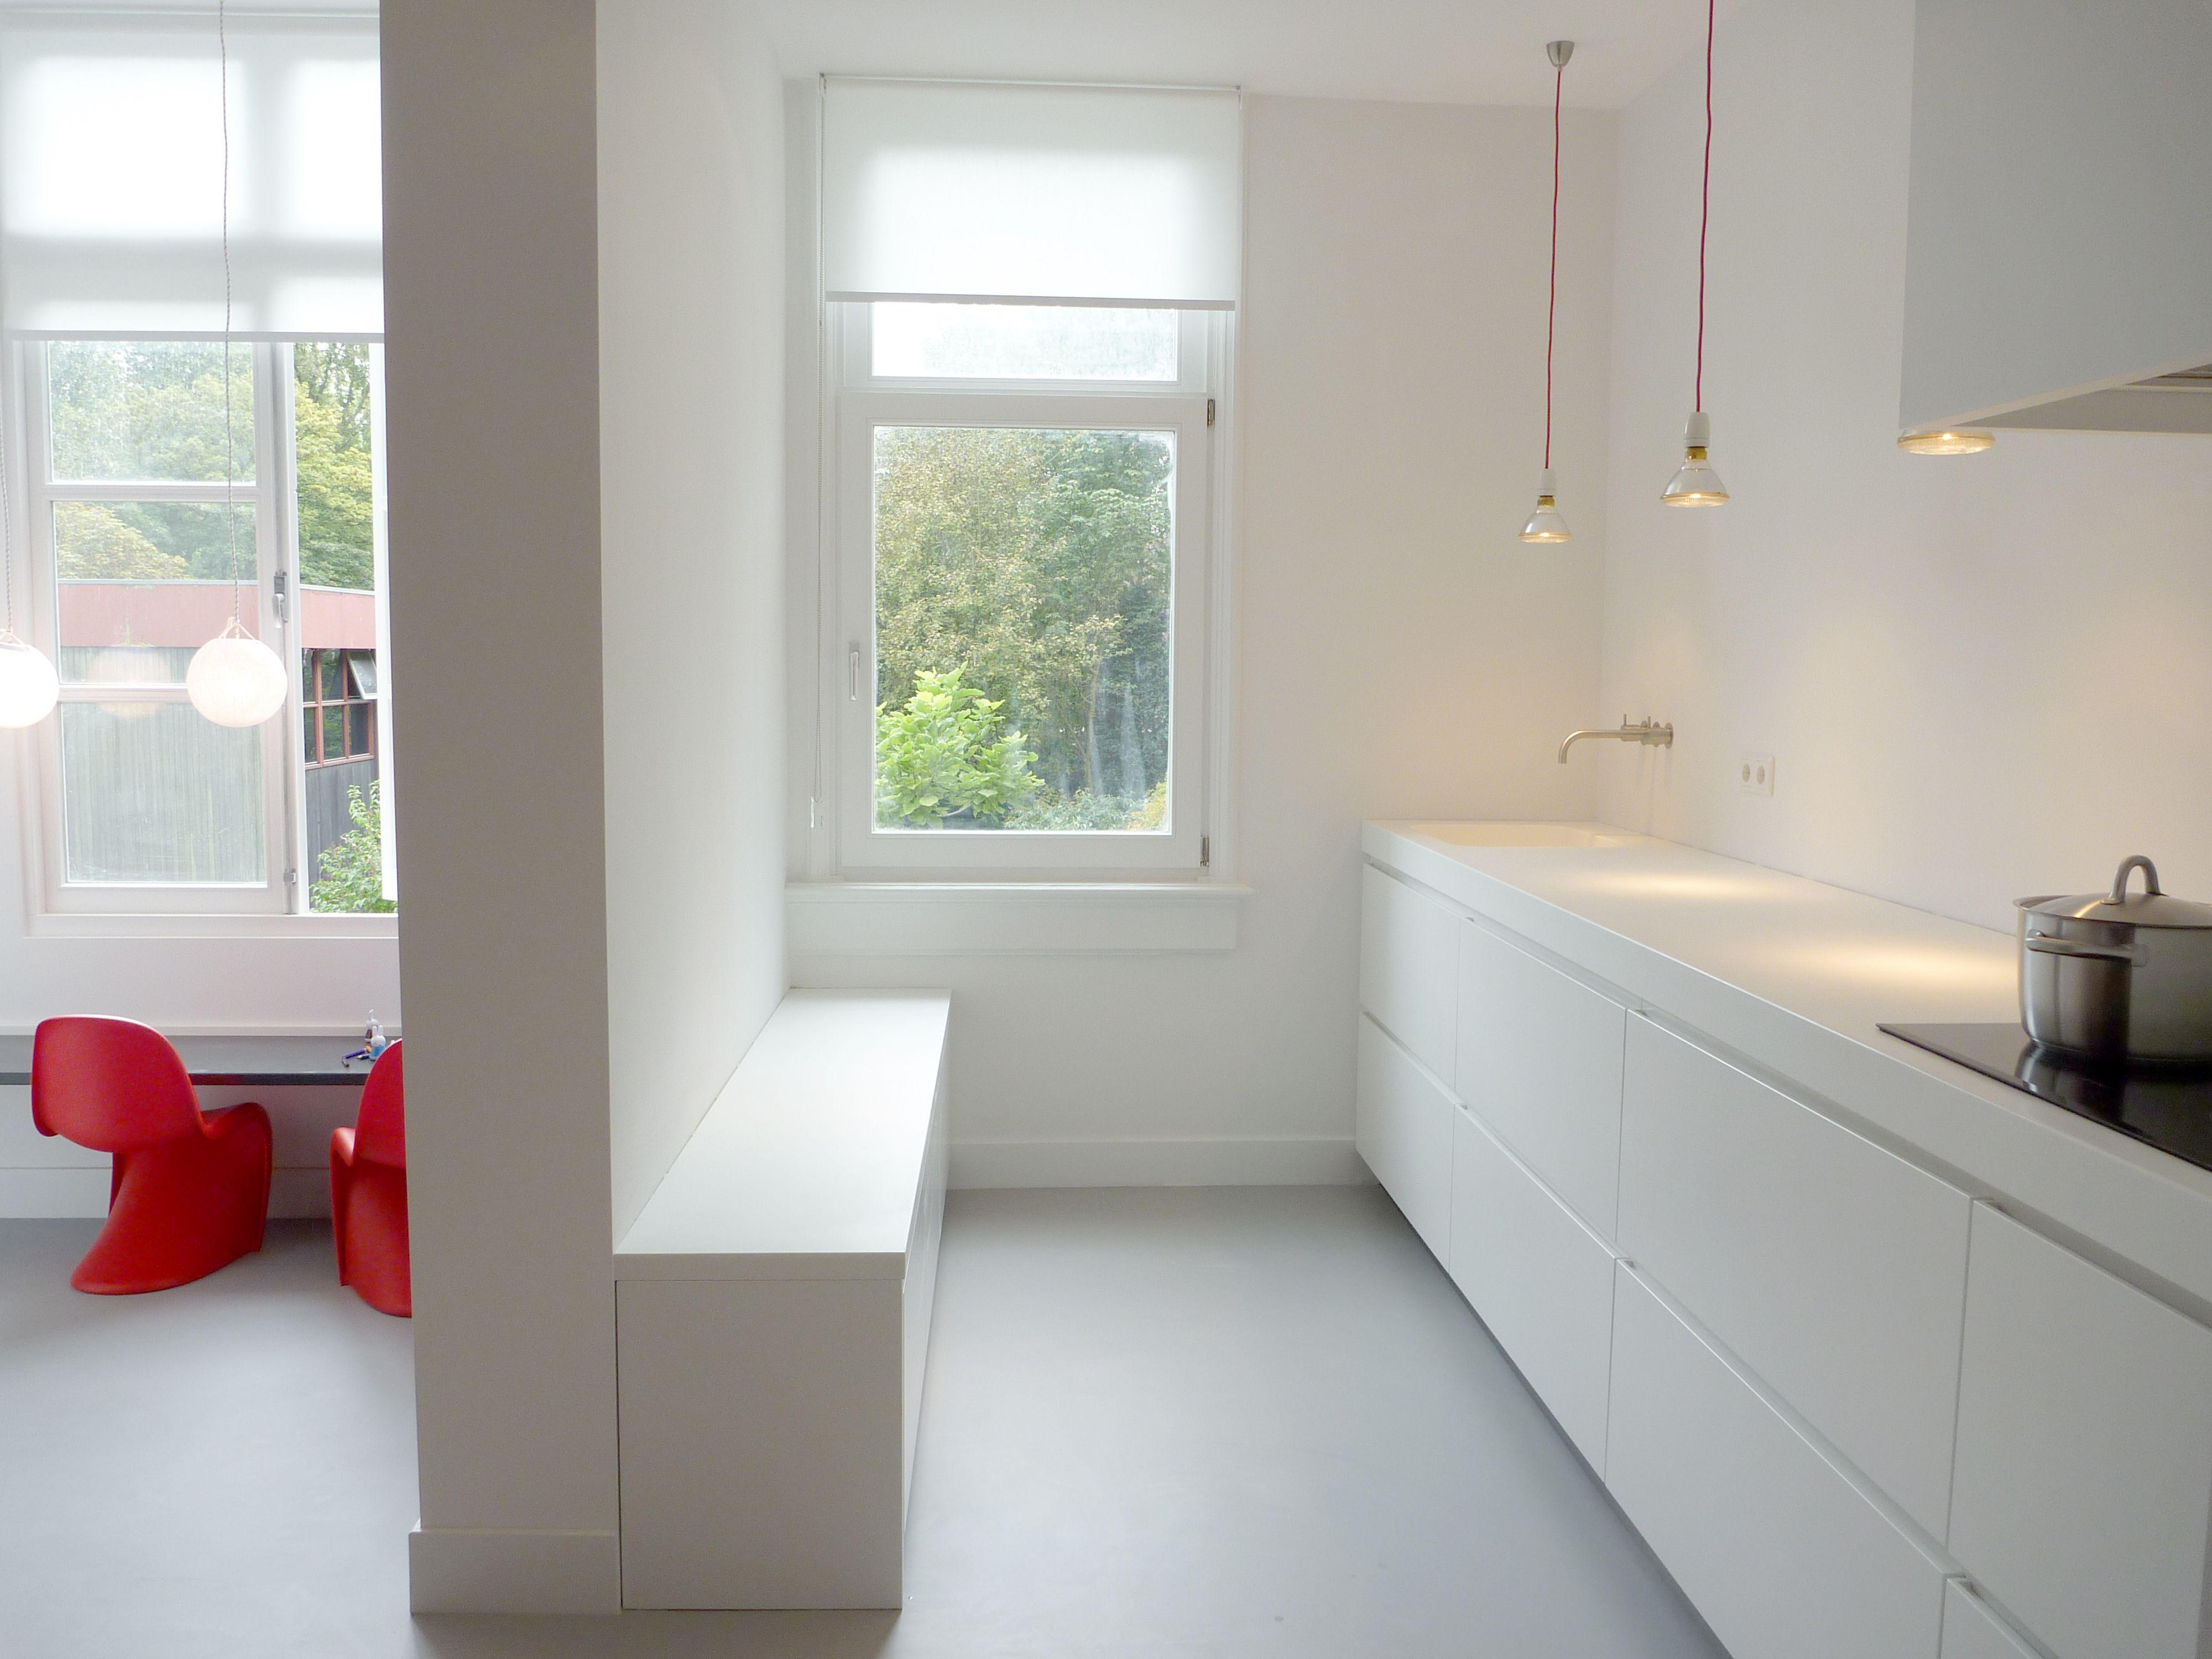 Studio ei keuken 1 keukenontwerp loft amsterdam for Interieurontwerp amsterdam